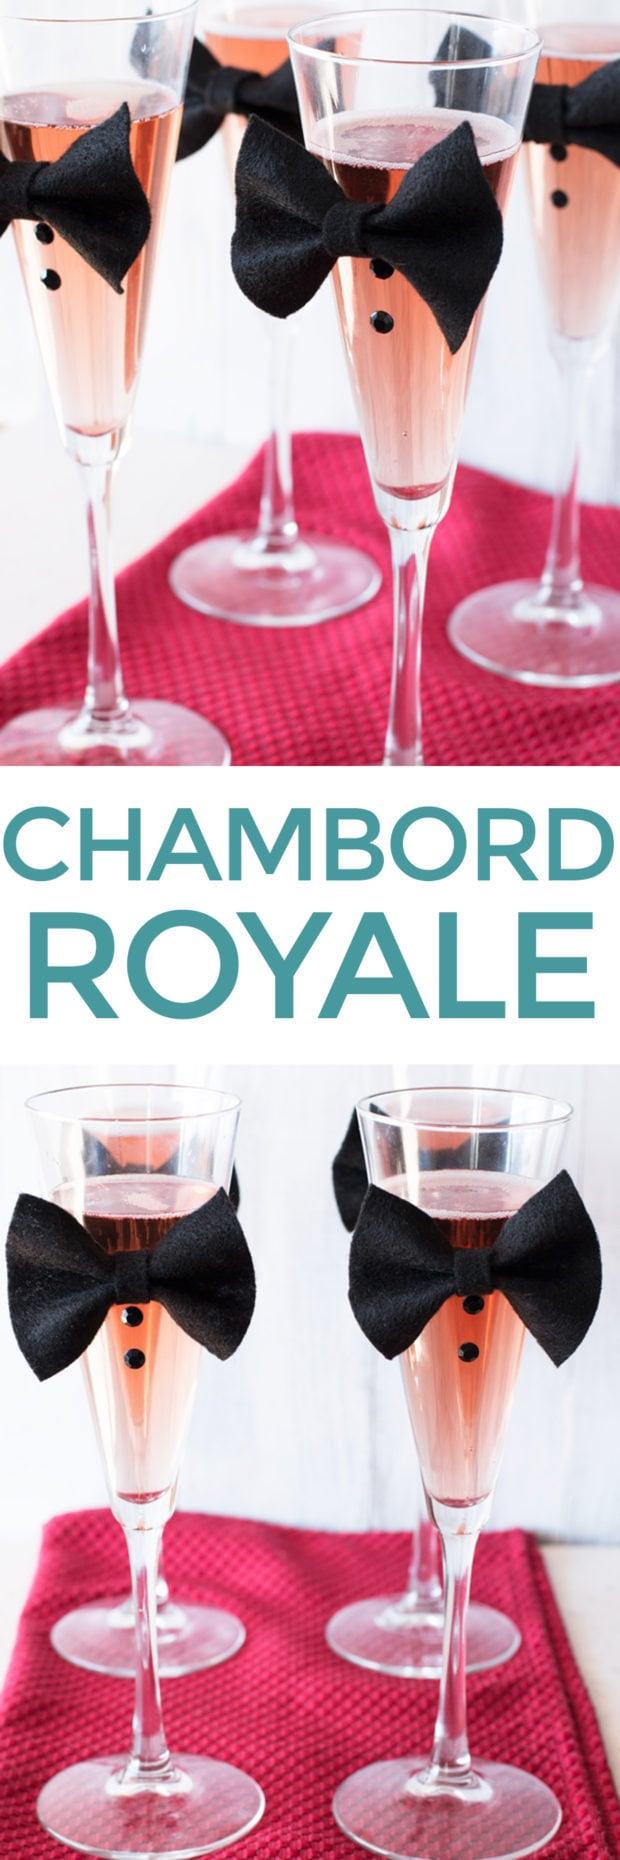 Oscar Chambord Royale